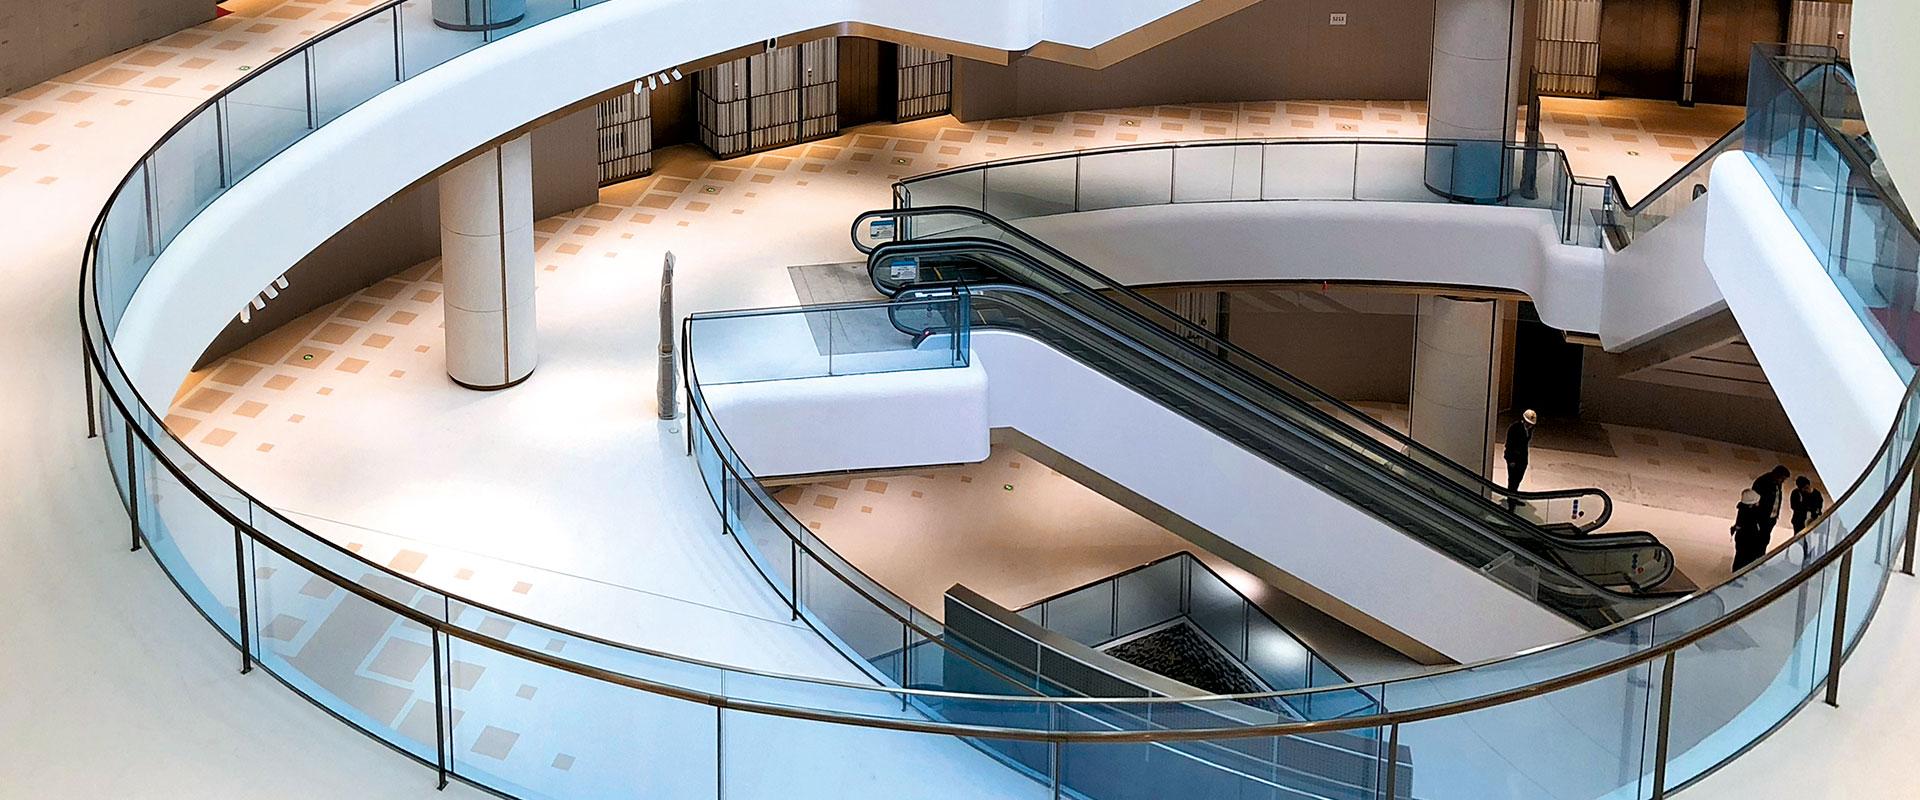 bfc-mall---shanghai-cina---SB-138-SB-137-SB-149-SB-139---retail-04---OK